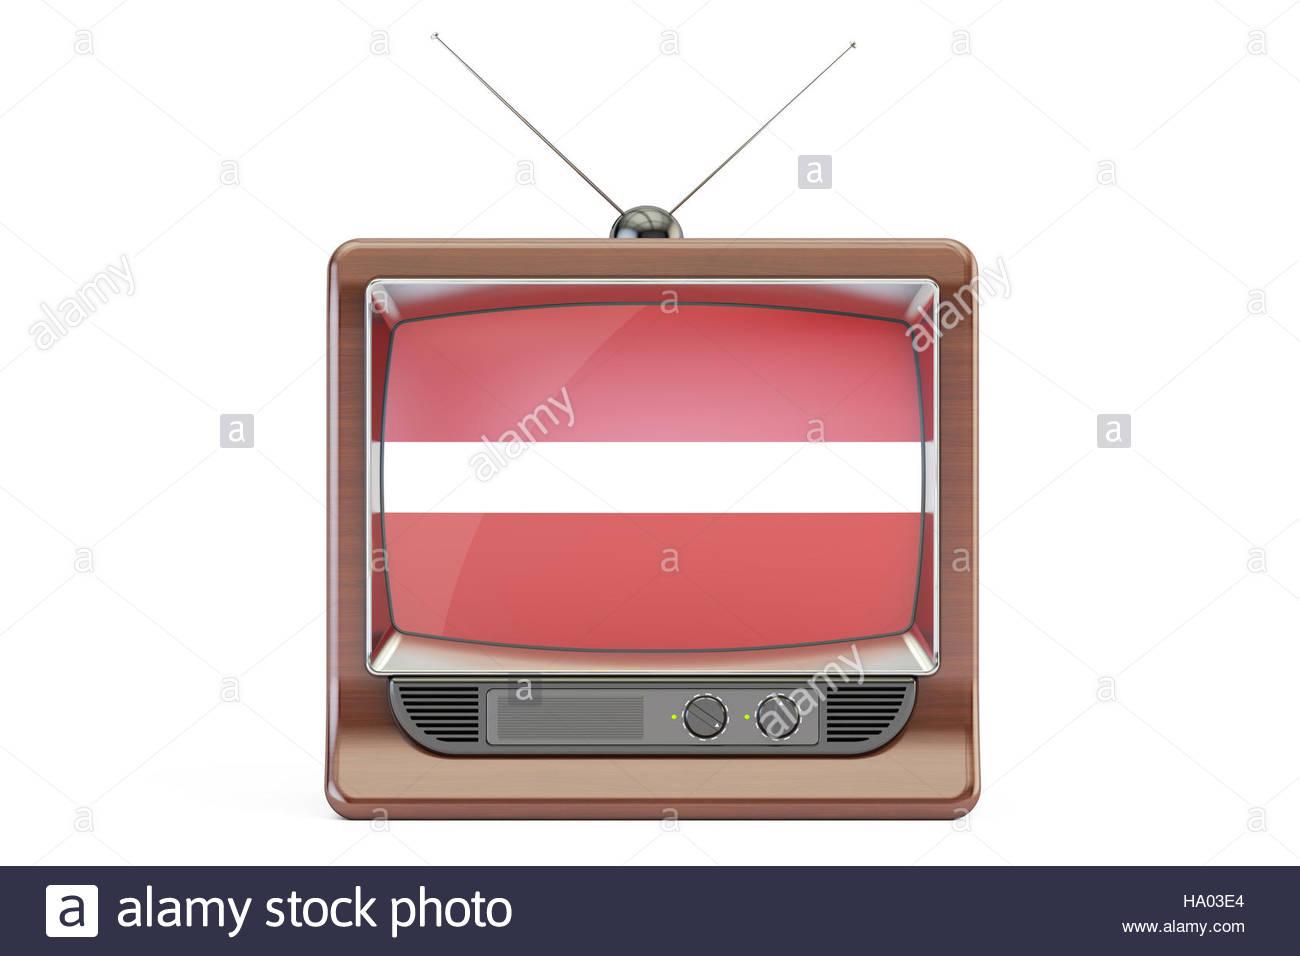 1300x956 > Flag Of Latvia Wallpapers